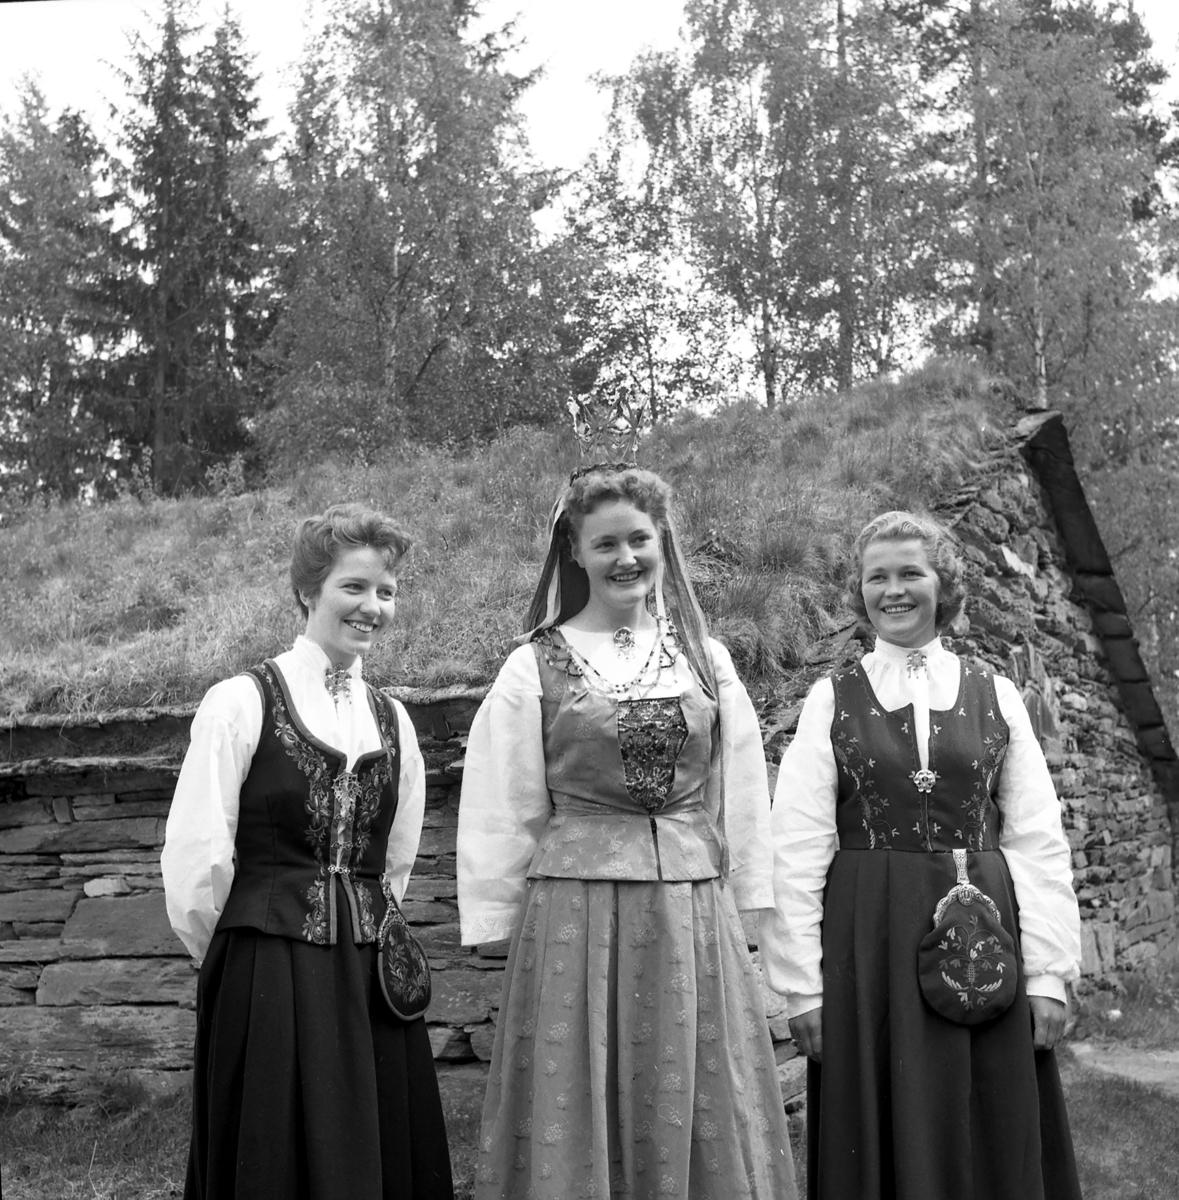 Glomdalsbruden Astrid Strypet fra Alvdal i midten sammen med ternene Aud Stenberg fra Grue (t.h.) og Hilda Eide fra Folldal,1958